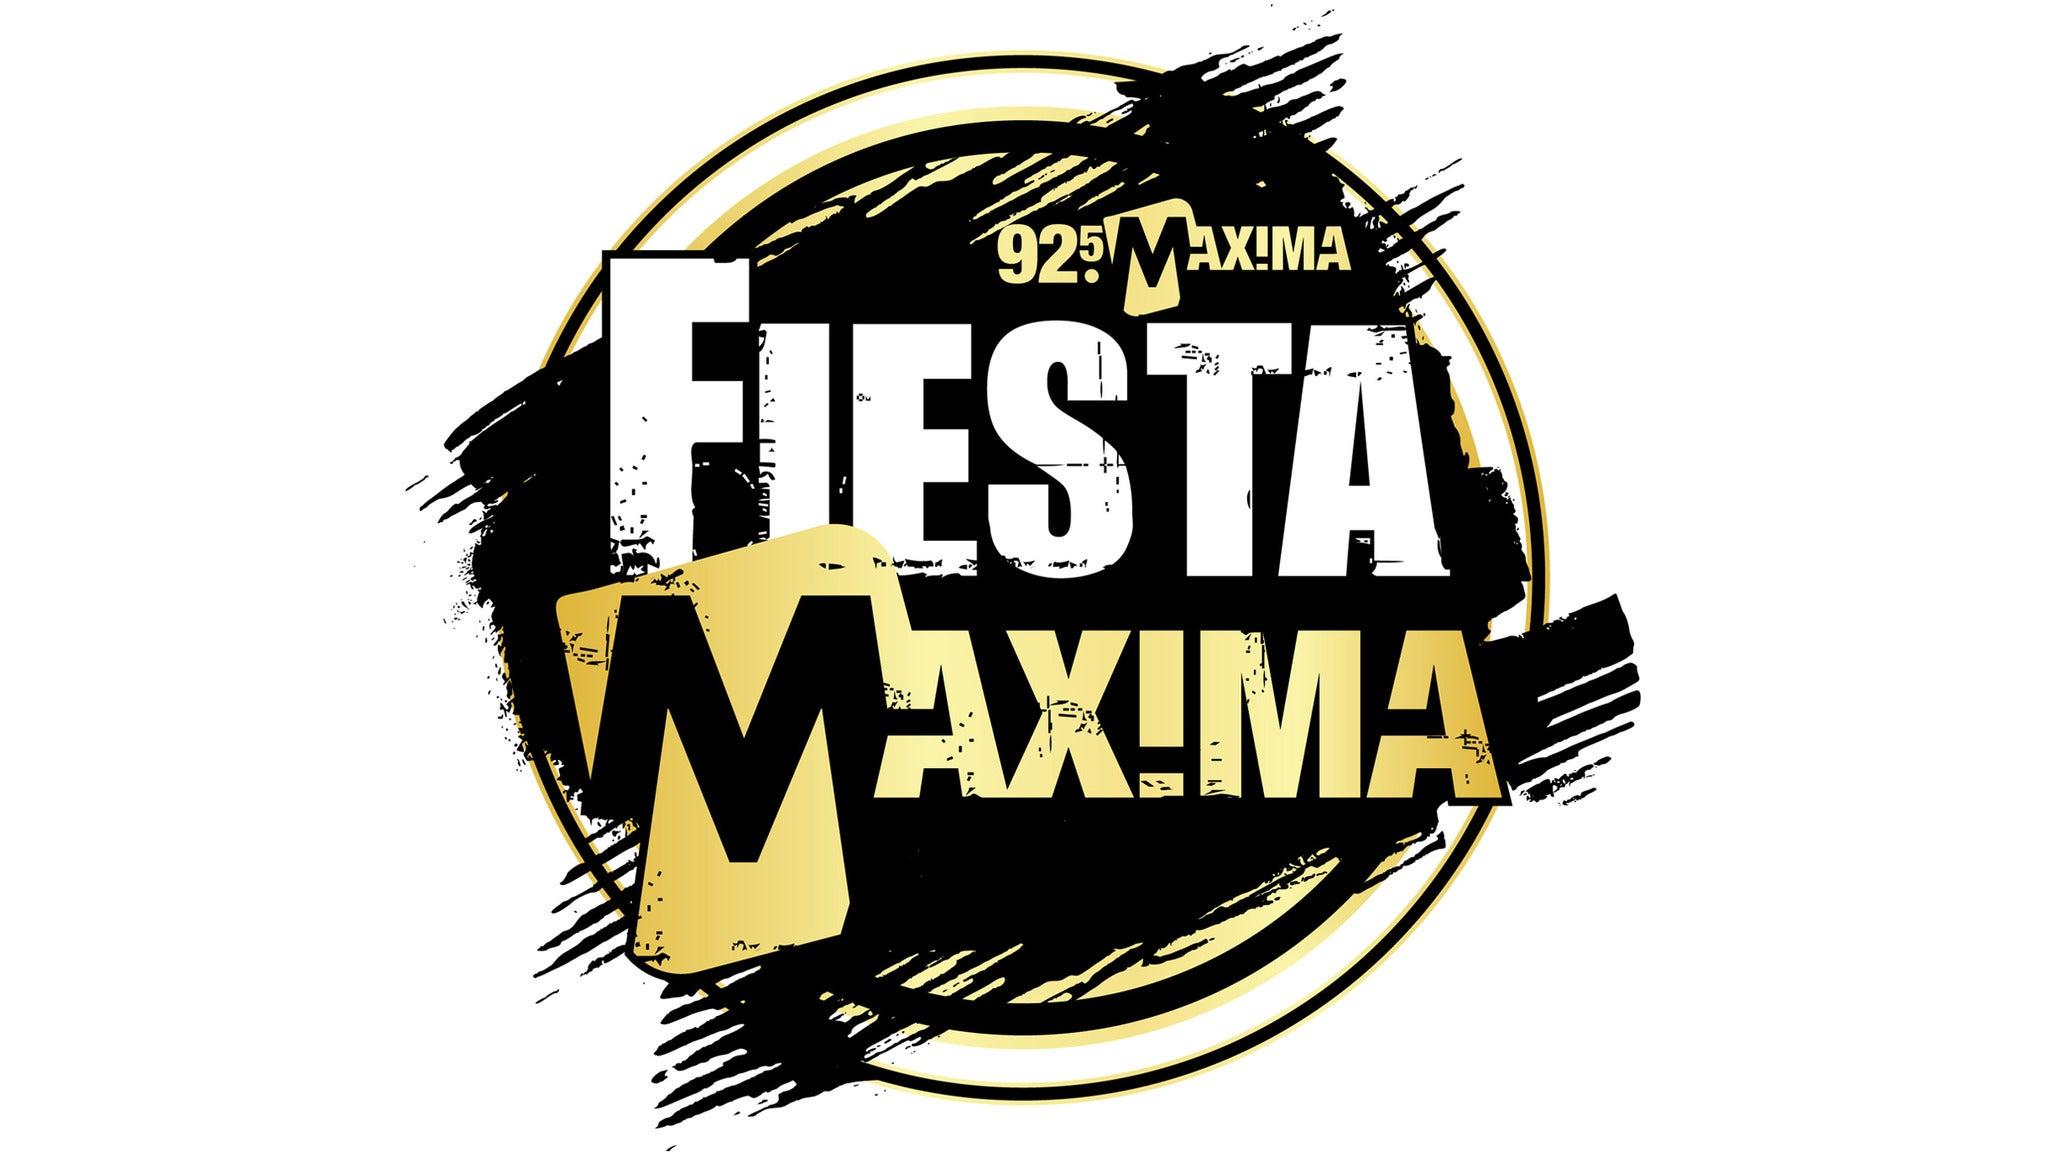 Fiesta Maxima 2017 featuring Daddy Yankee and Gente De Zona